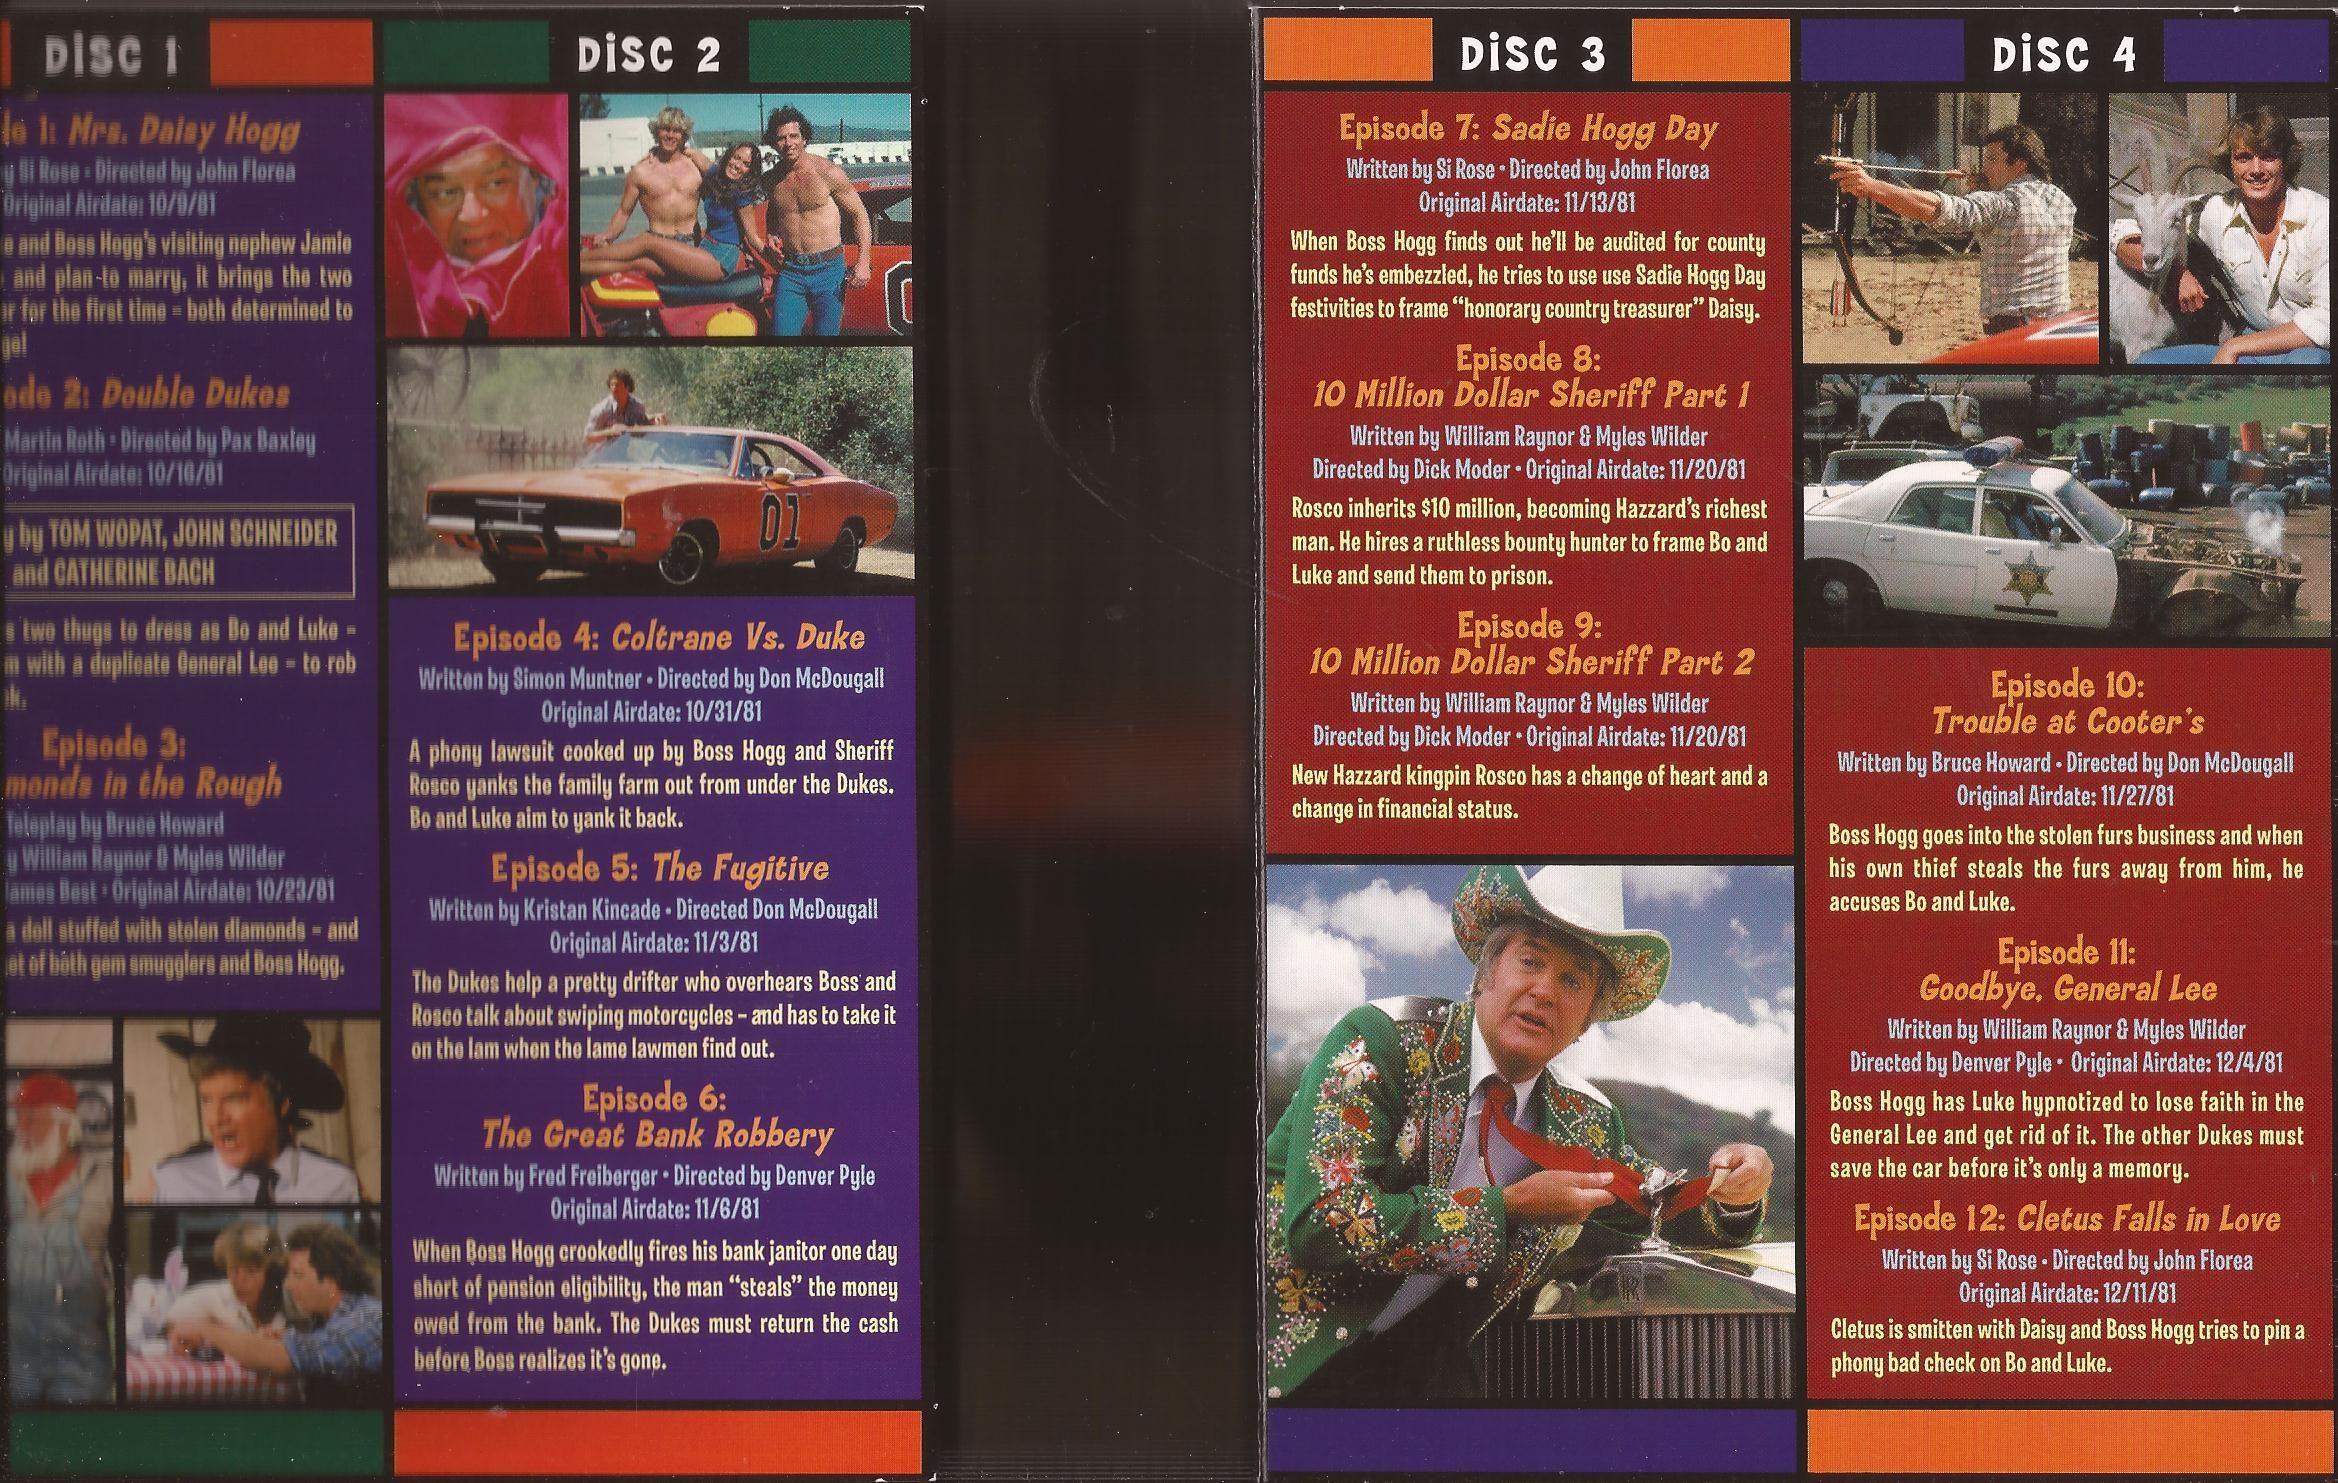 dukes of hazzard season 4 dvd